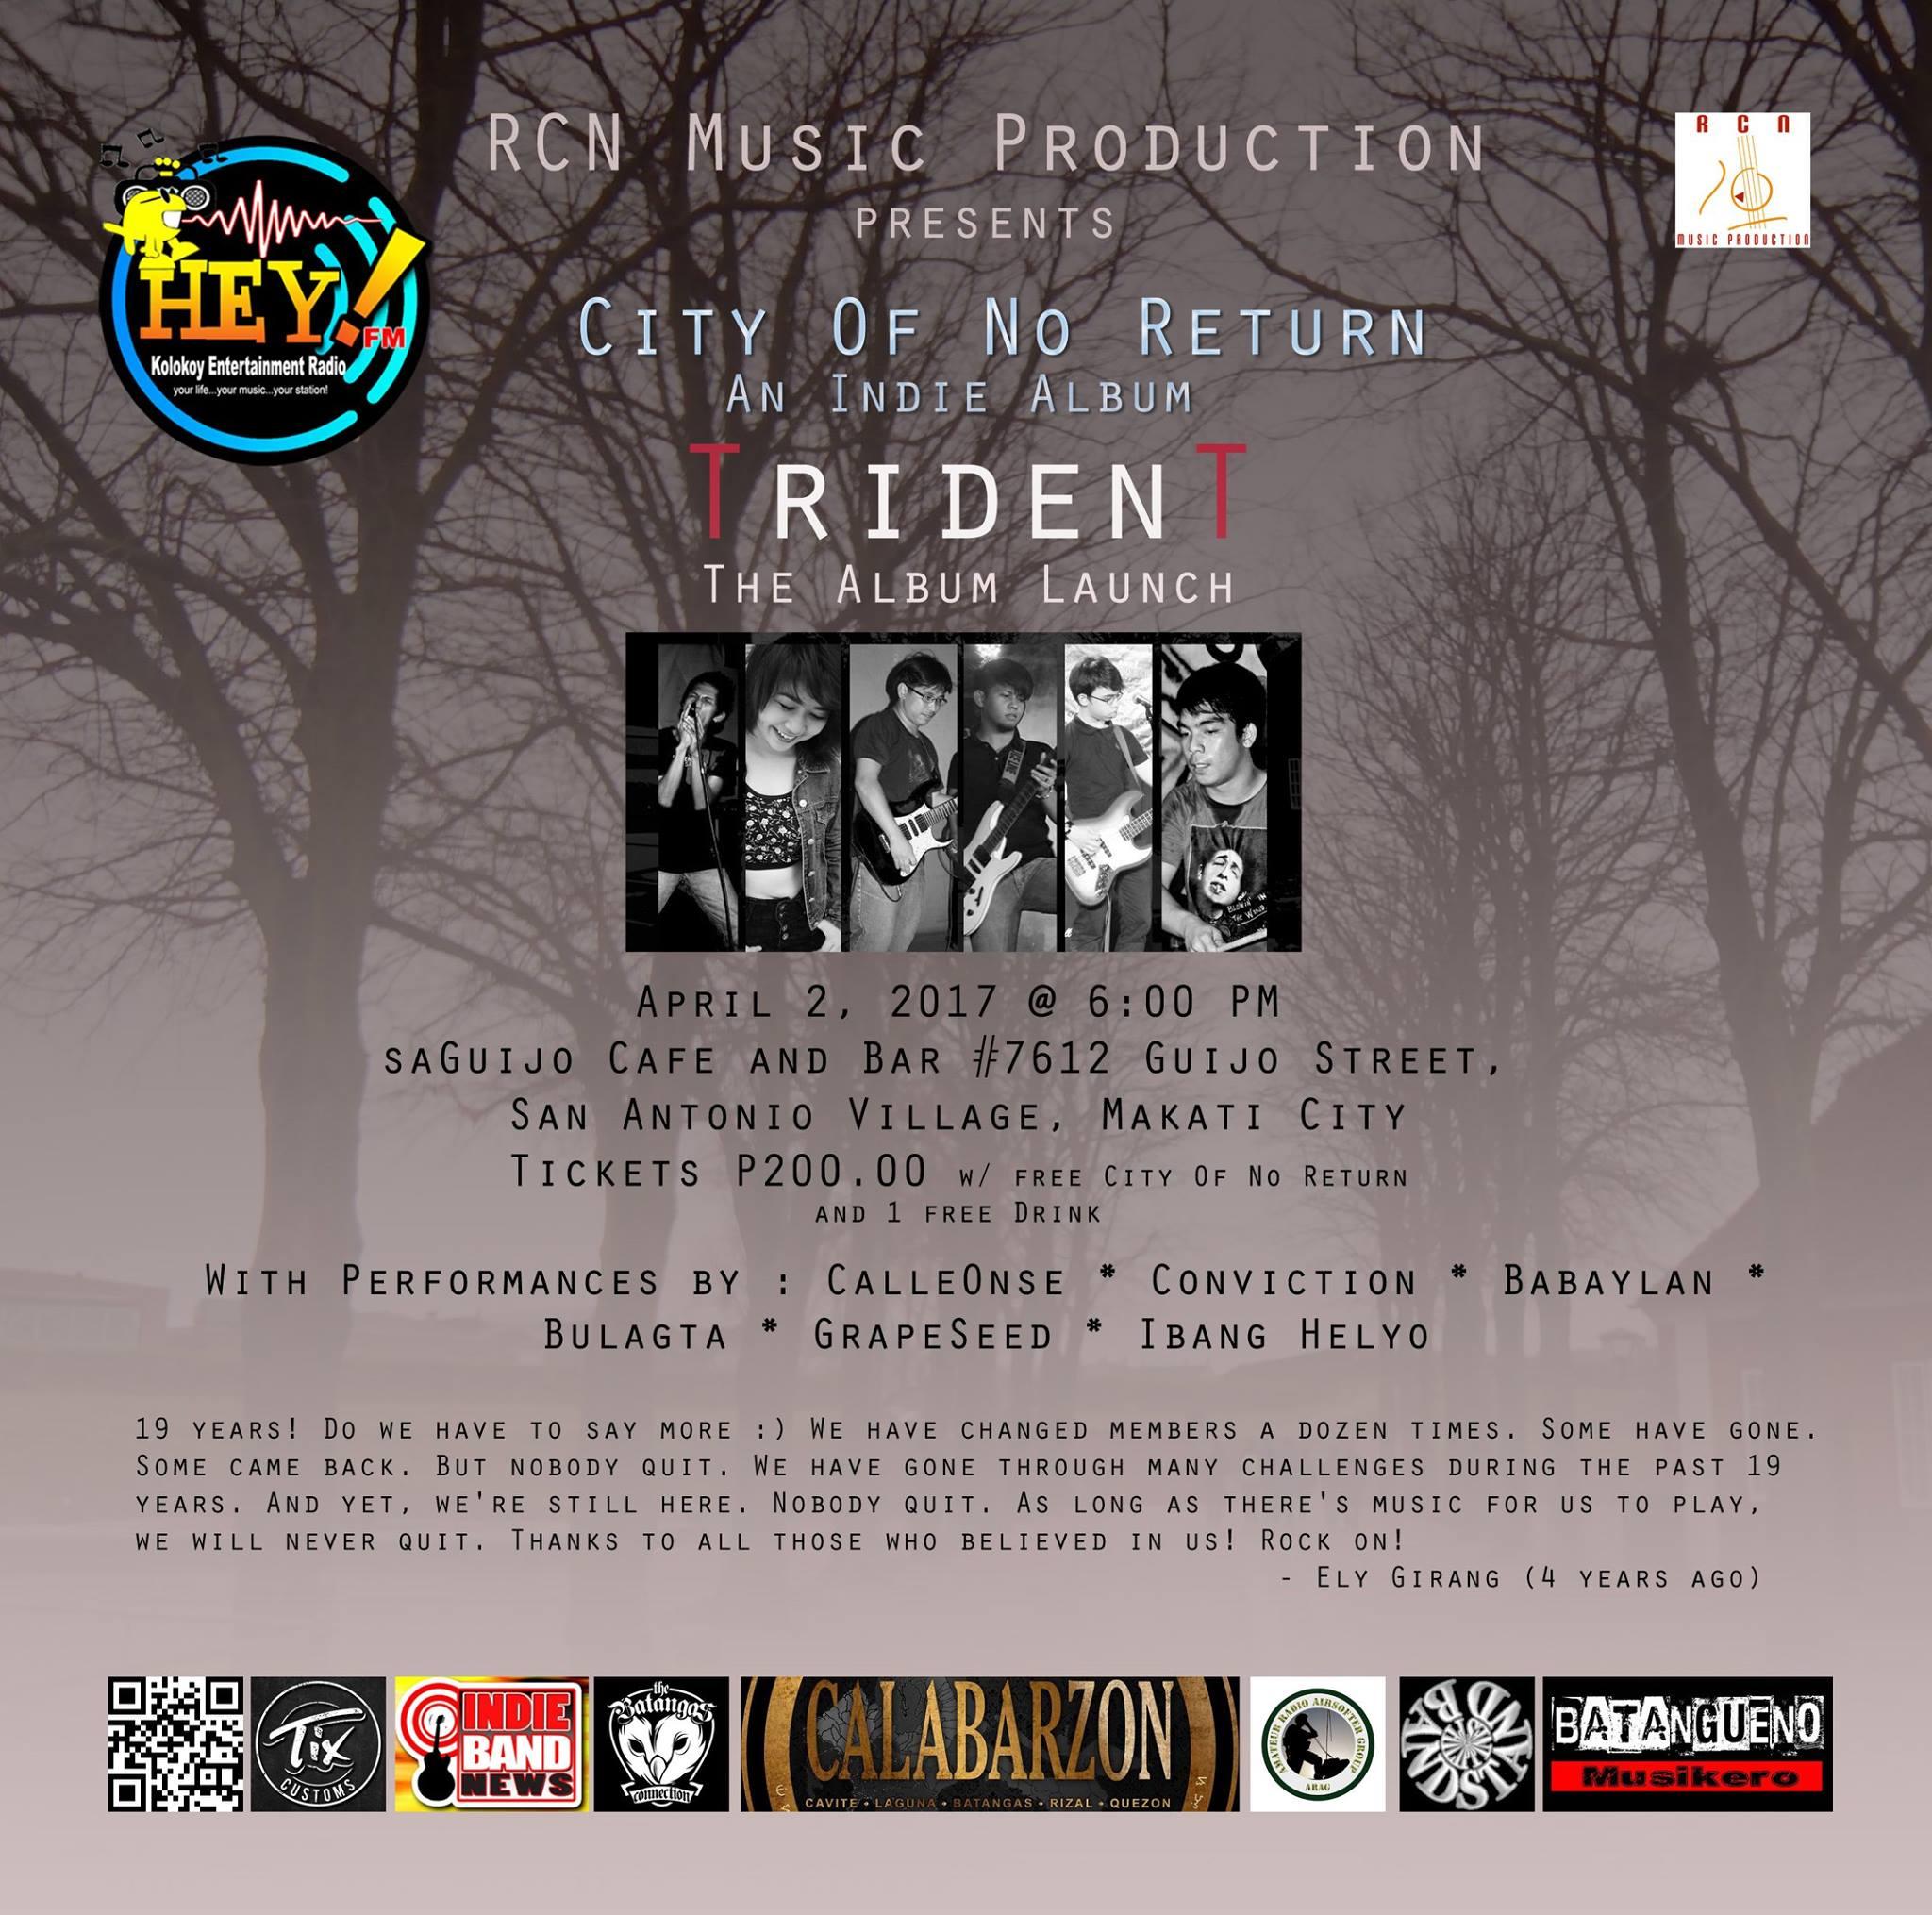 TridenT - City Of No Return